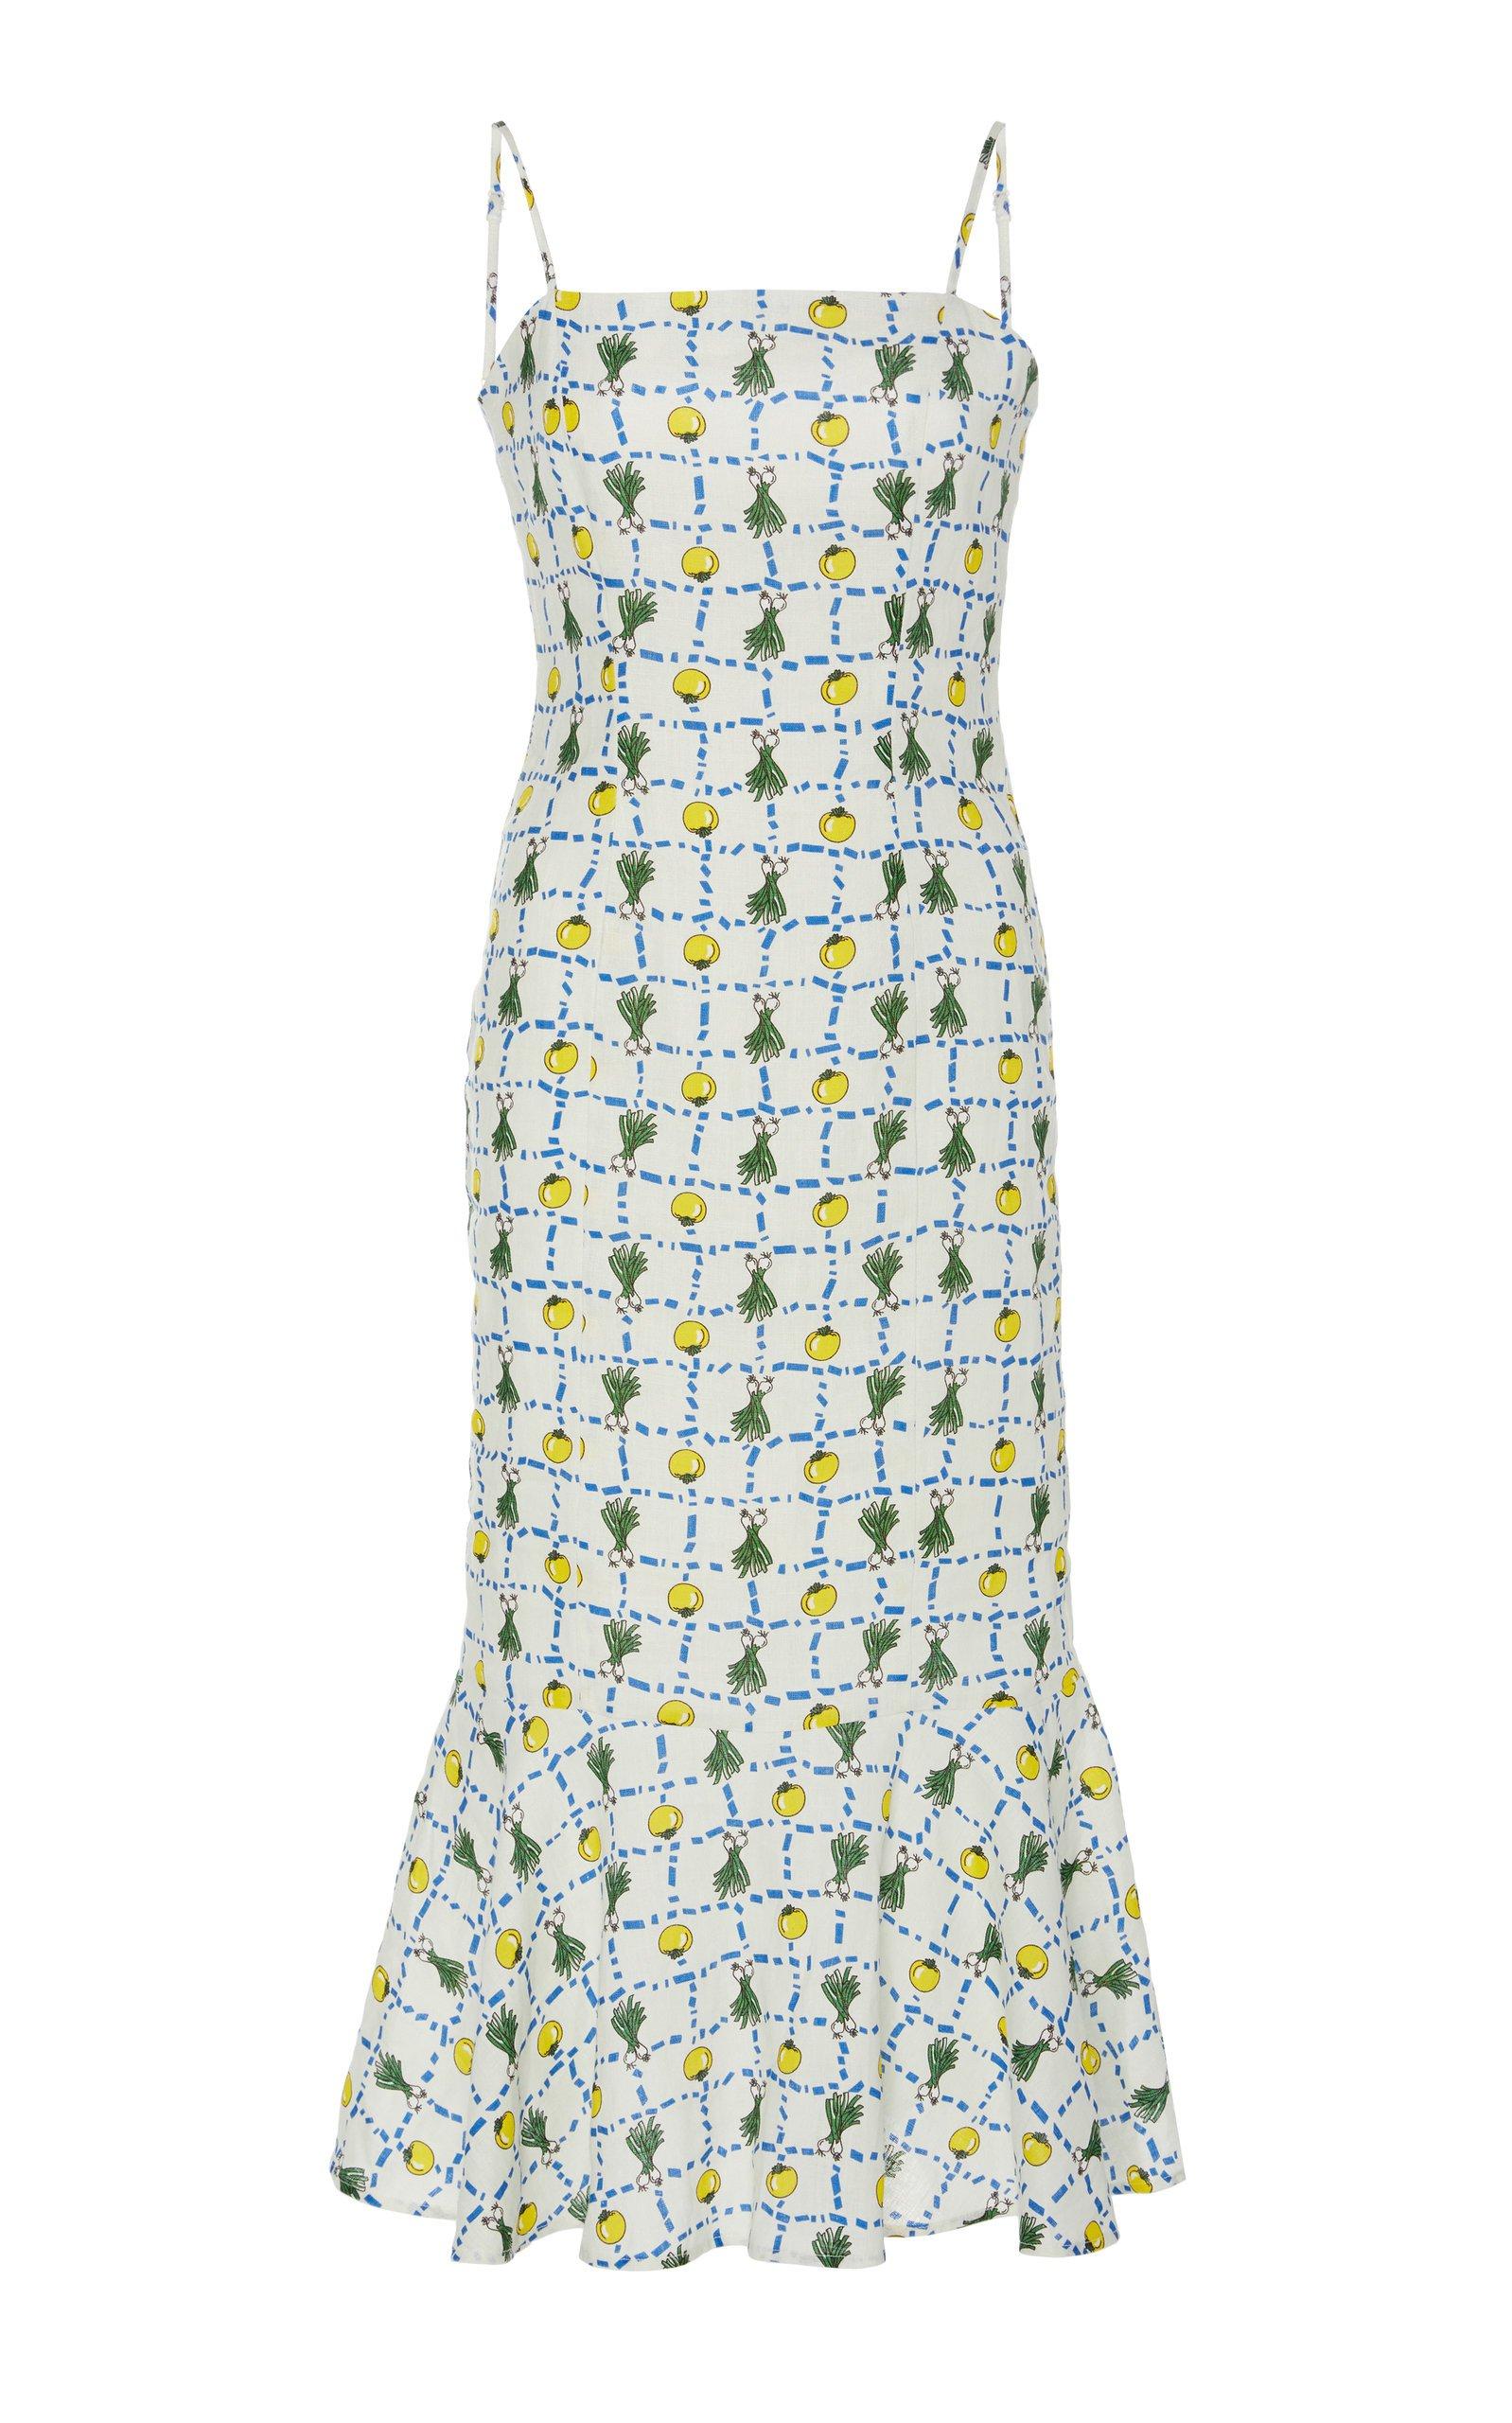 Staud Lychee Printed Linen Midi Dress Size: 8